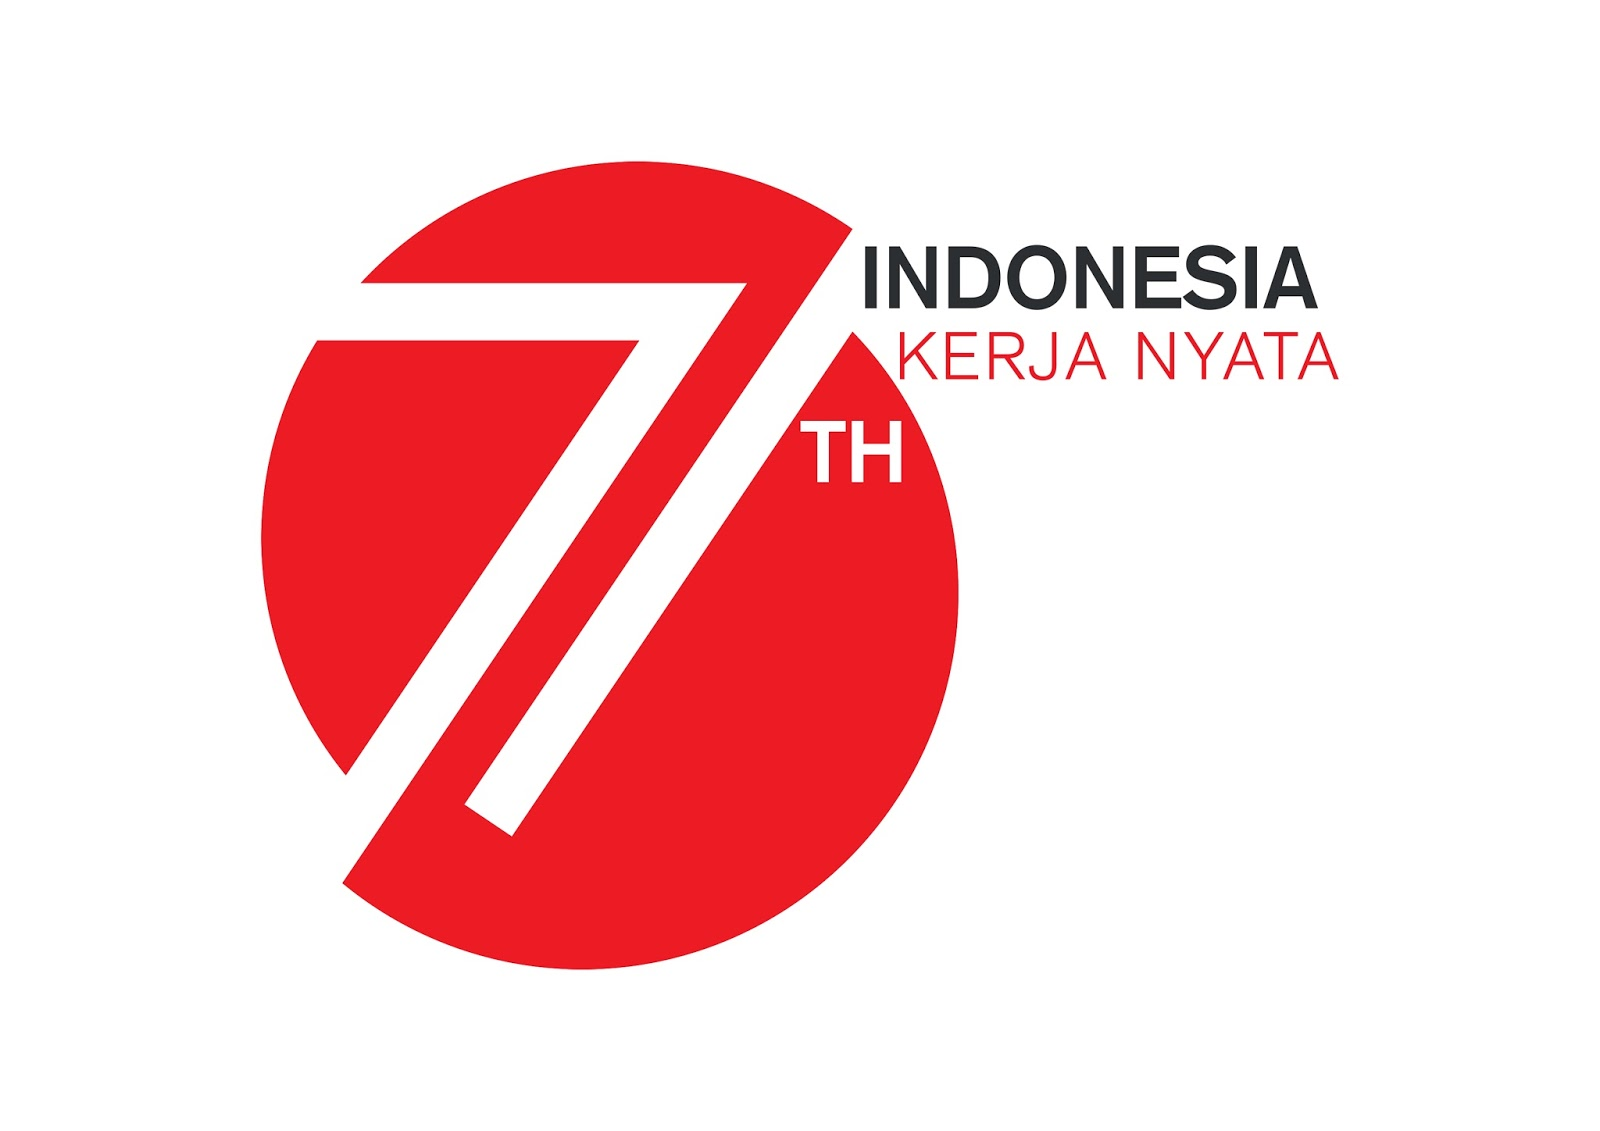 Logo Resmi HUT Ke 71 Kemerdekaan Republik Indonesia Tahun 2016